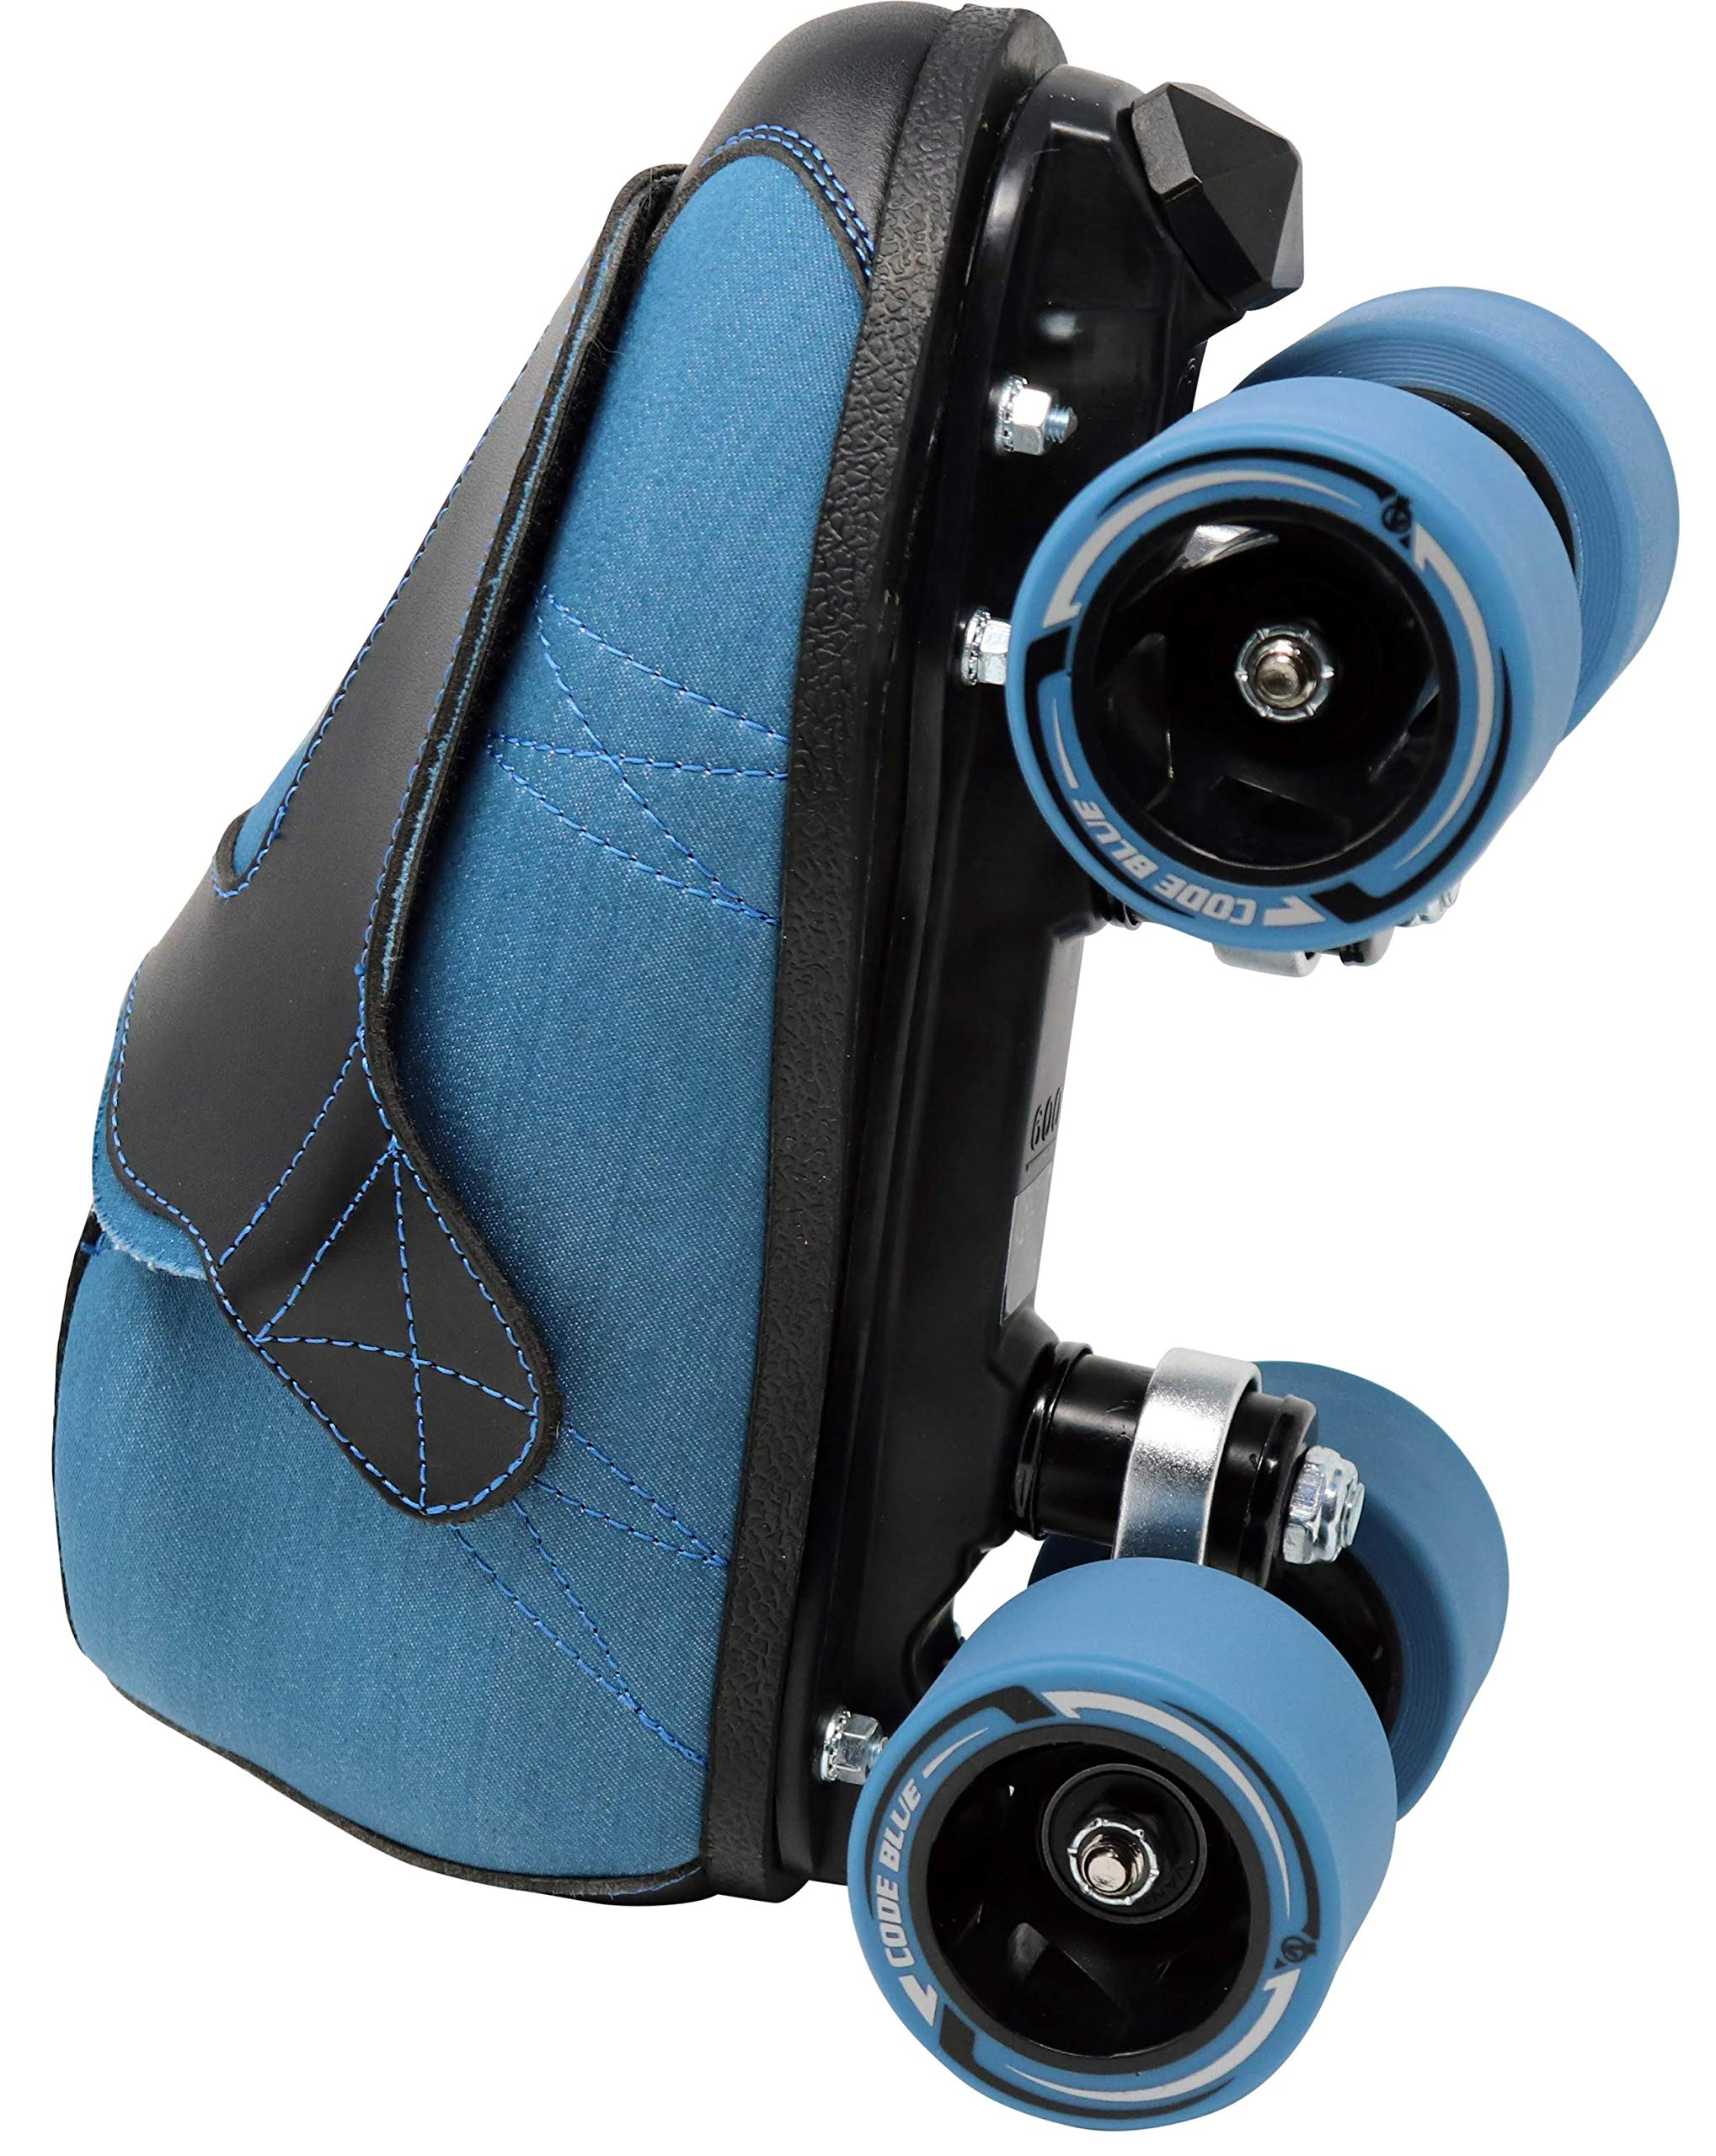 VNLA Code Blue Jam Skate - Mens & Womens Speed Skates - Quad Skates for Women & Men - Adjustable Roller Skate/Rollerskates - Outdoor & Indoor Adult Quad Skate - Kid/Kids Roller Skates (Size 8) by VNLA (Image #5)